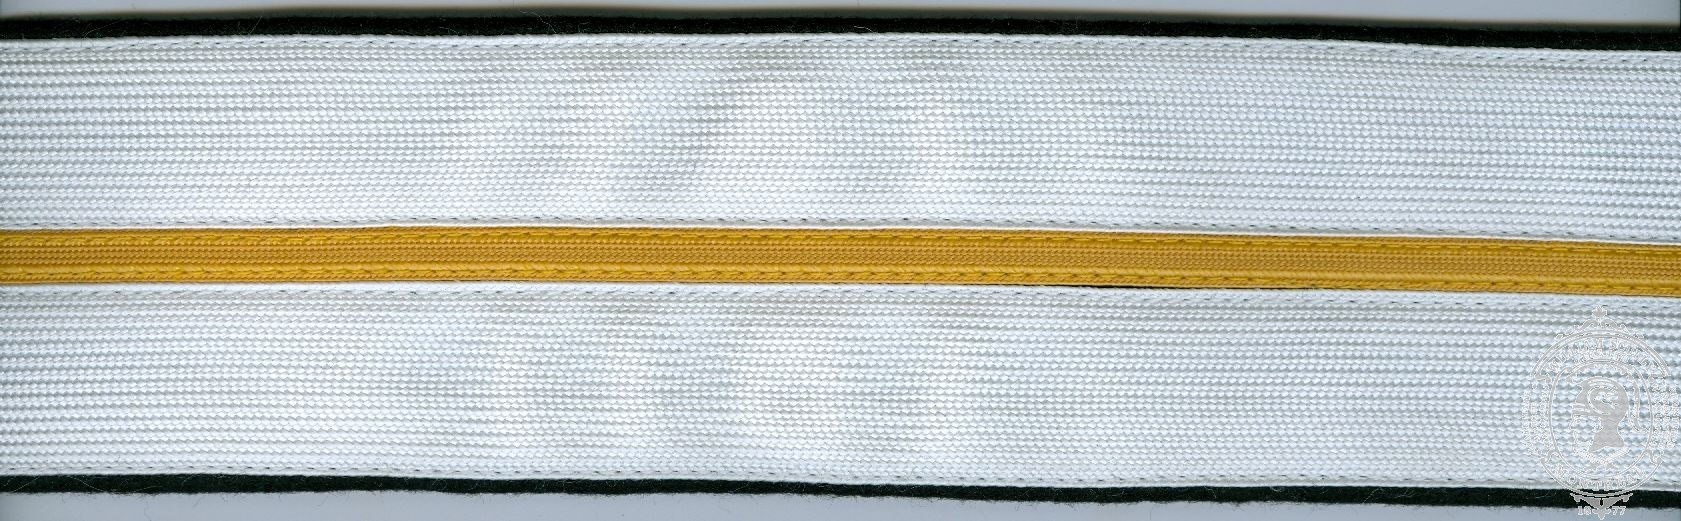 "Ceinture en tissu, 2-1/4"", 2 rangées galon rayon 1"" avec bande mince"